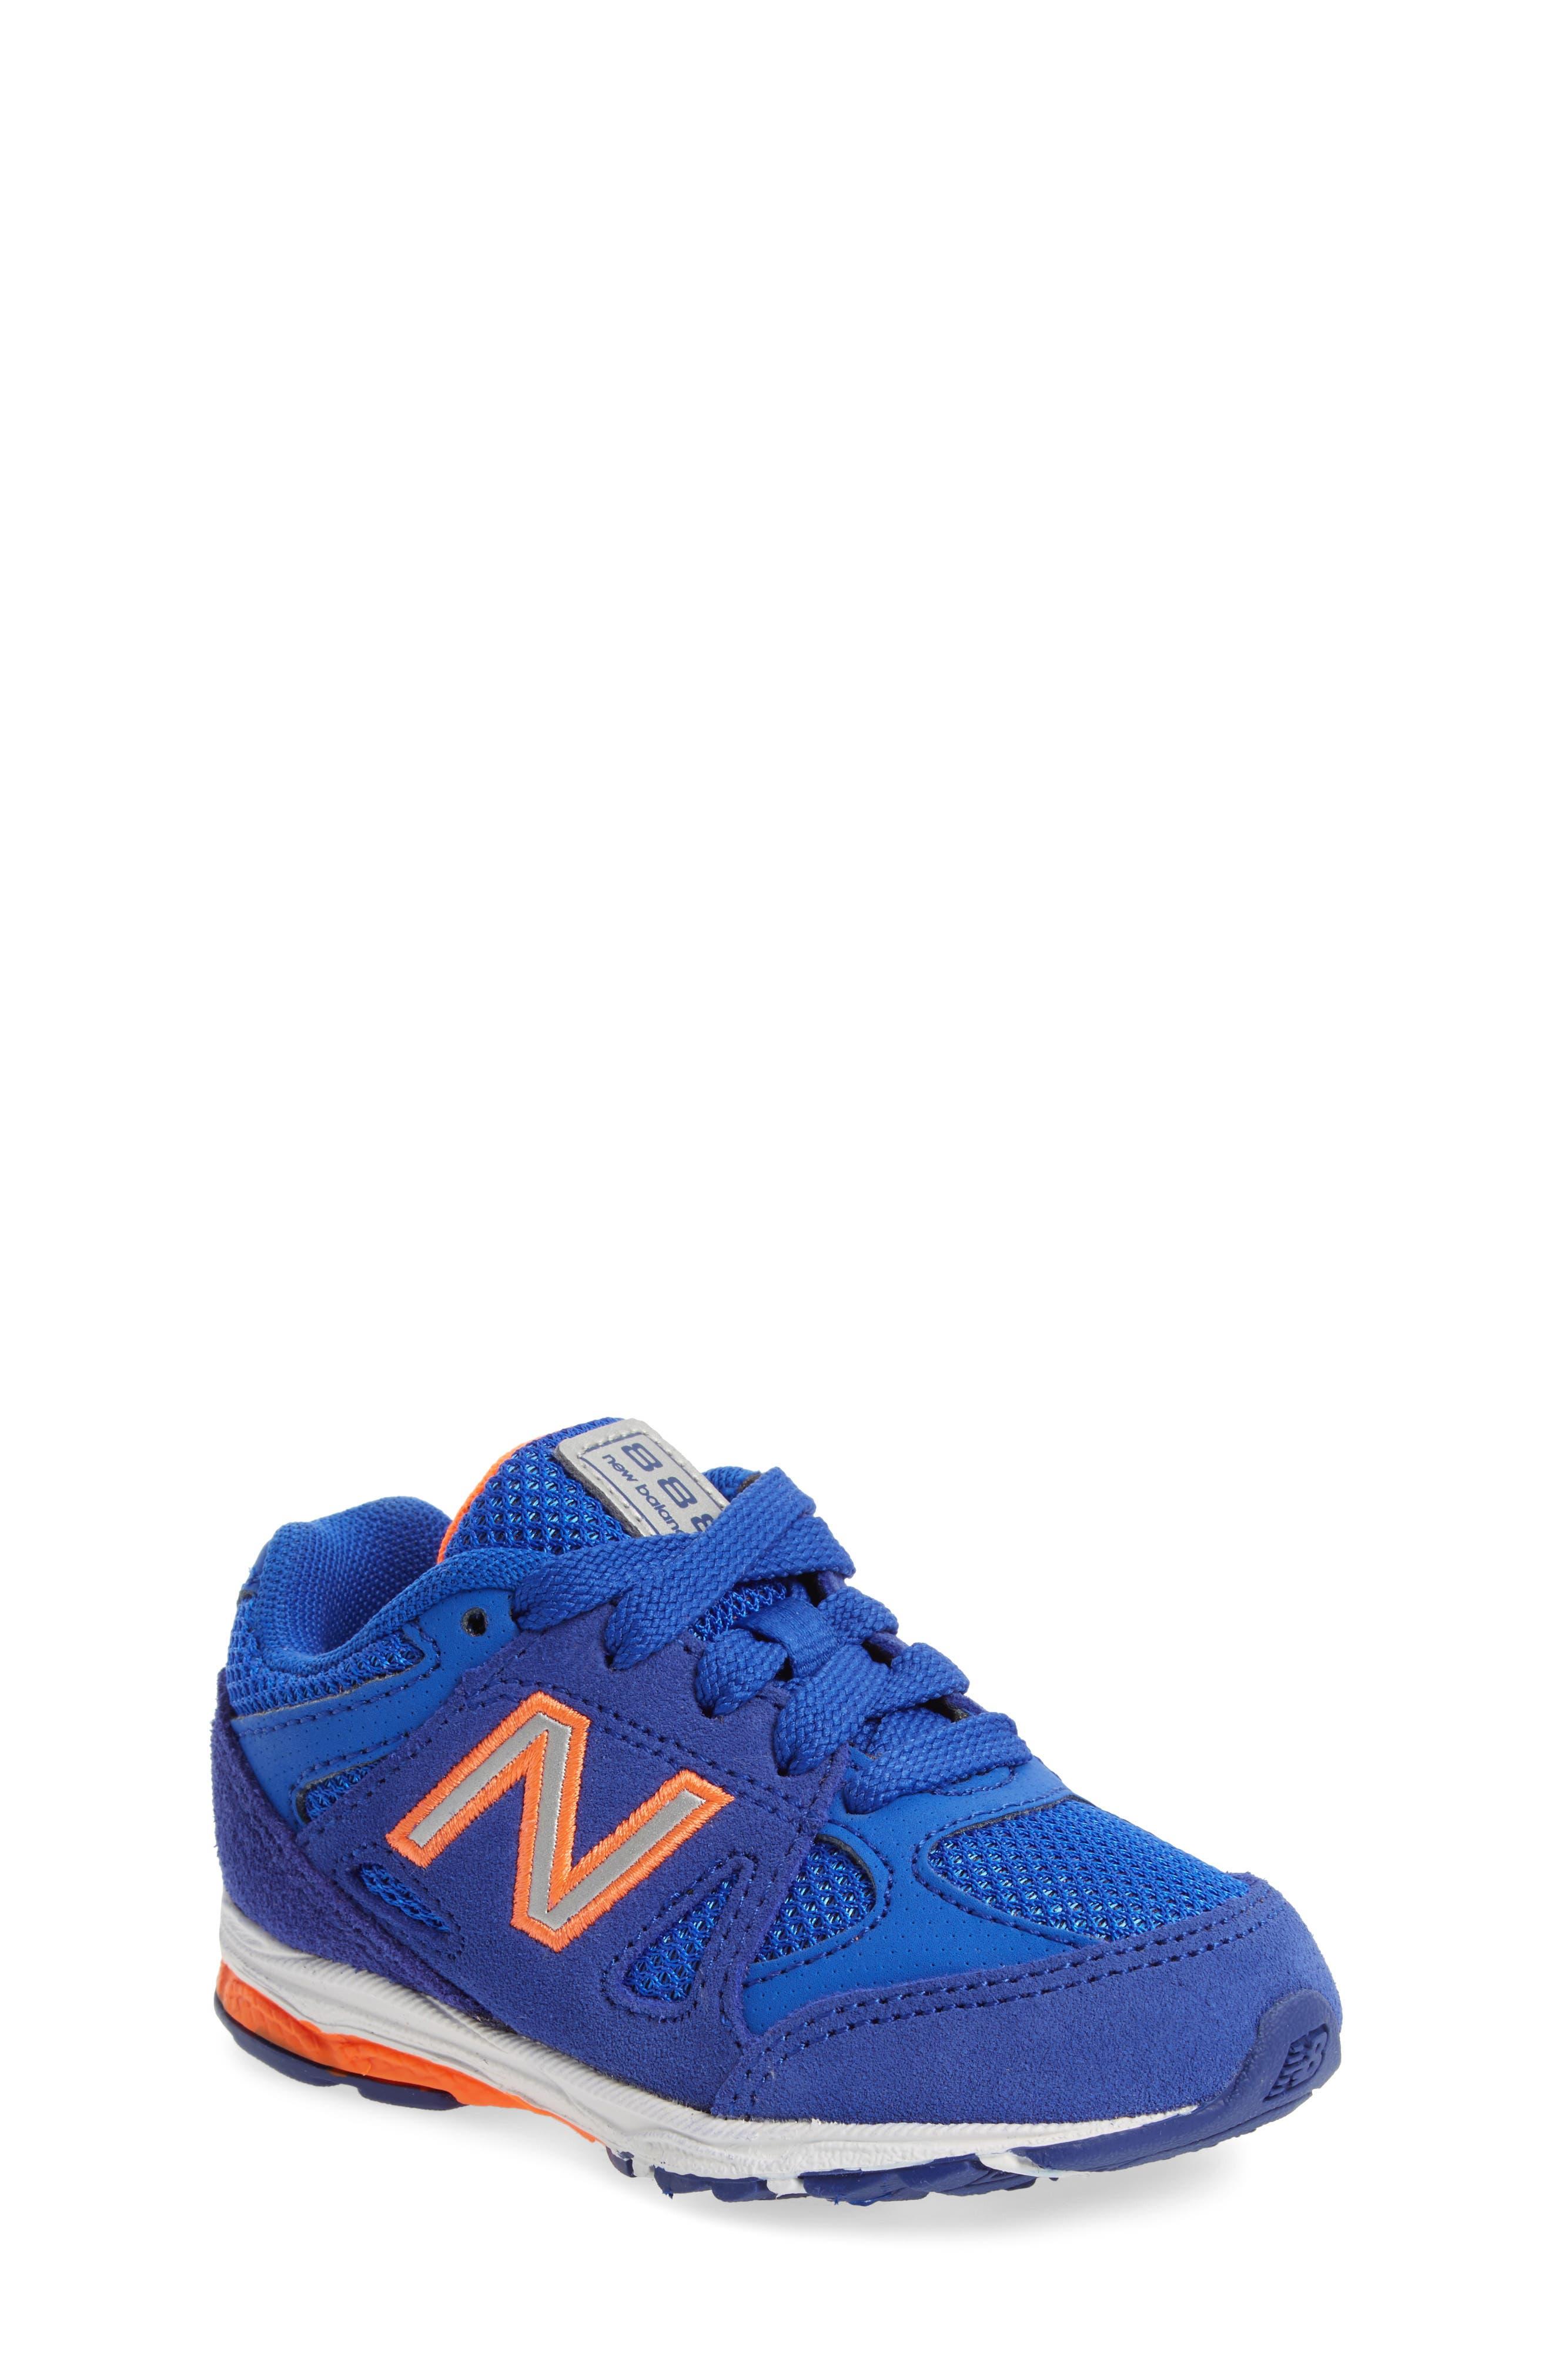 888 Sneaker,                             Main thumbnail 1, color,                             Pacific